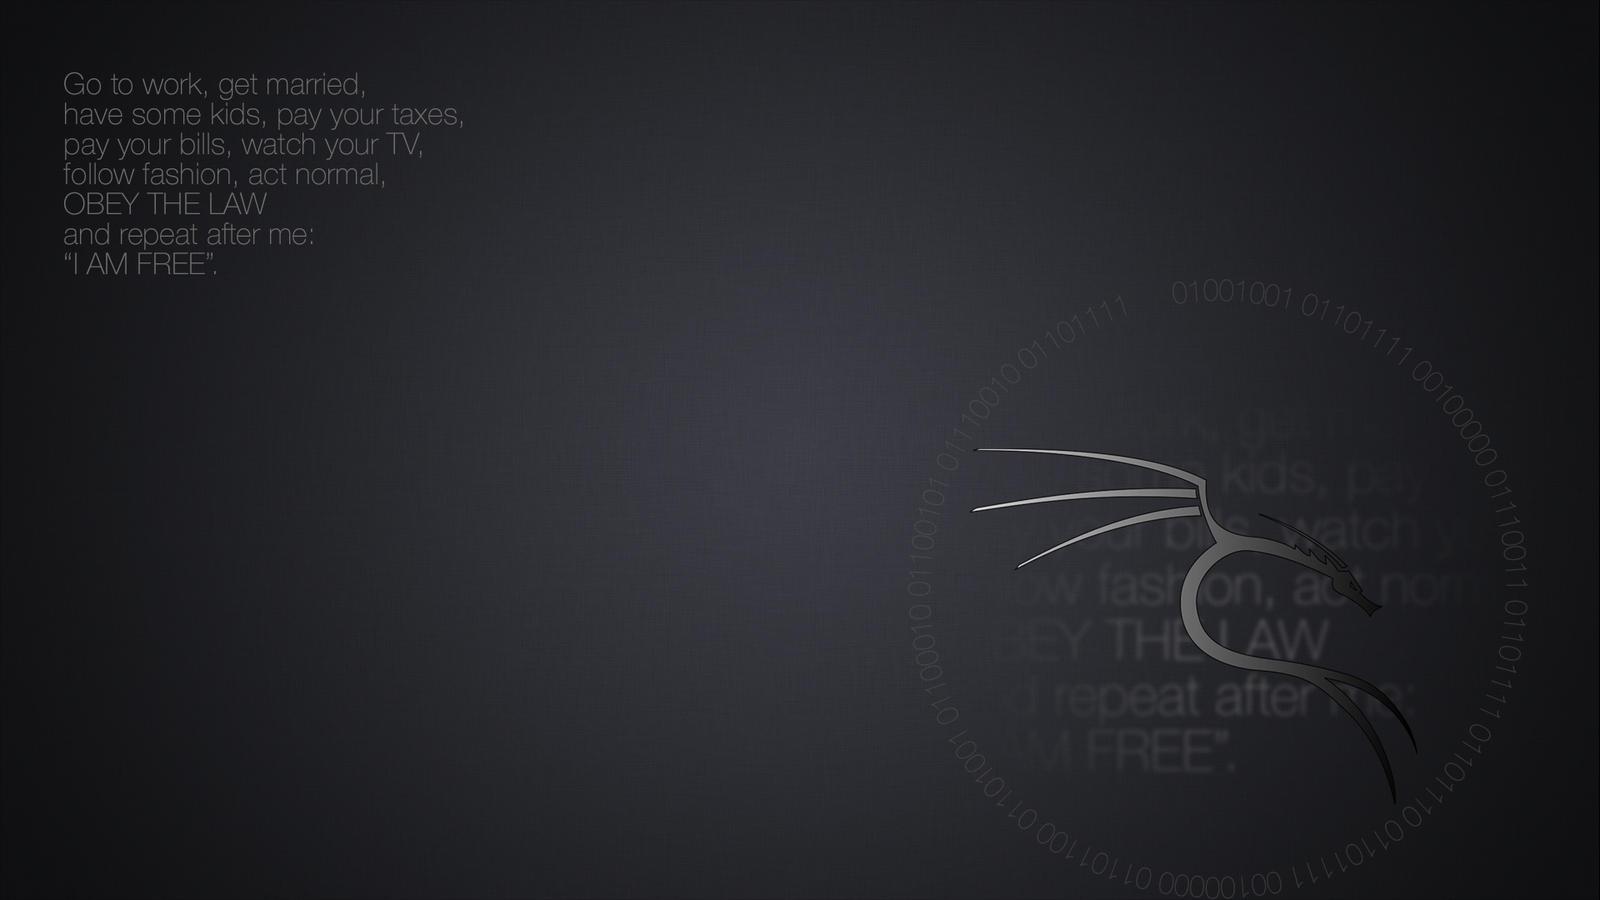 Kali Linux Wallpaper I Am Free 2 By Salvoru87 On Deviantart